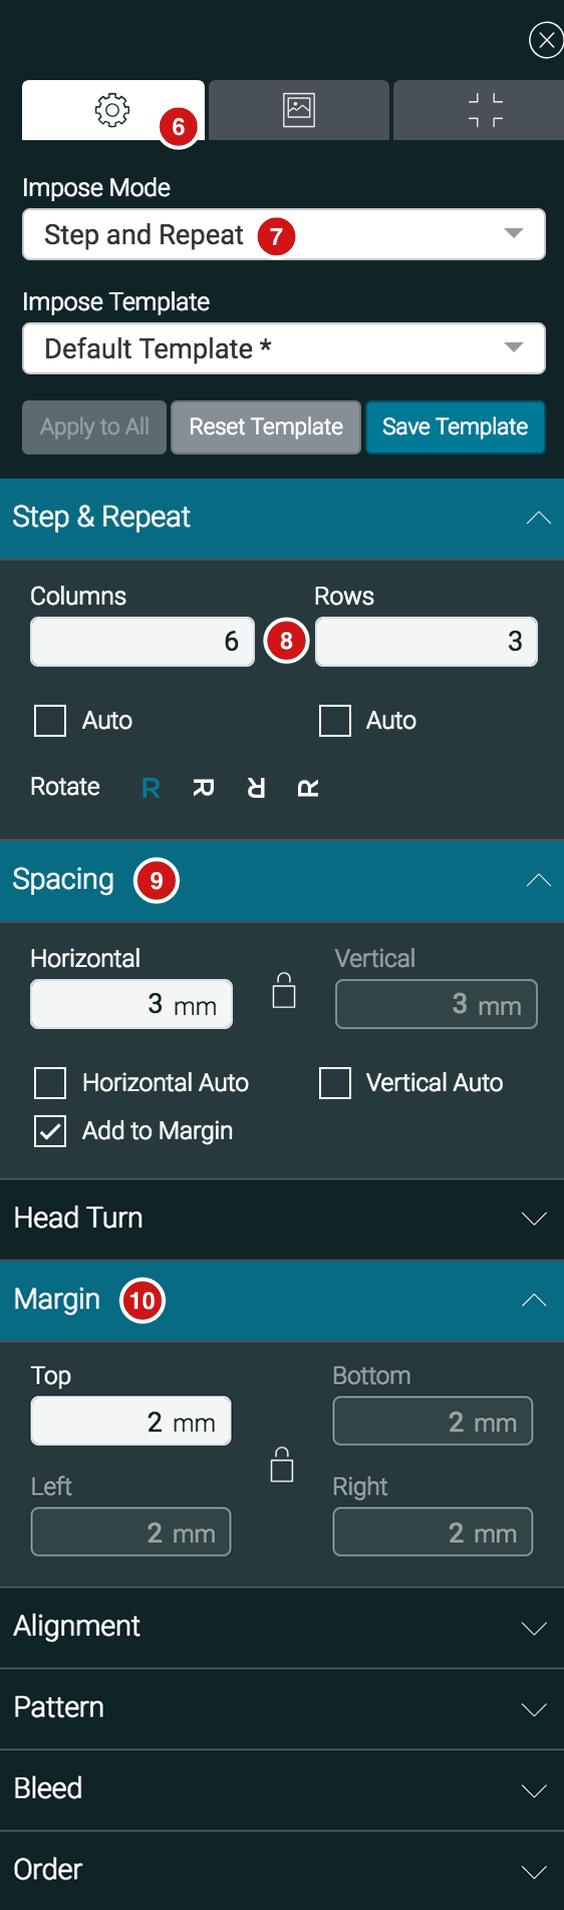 Impose settings